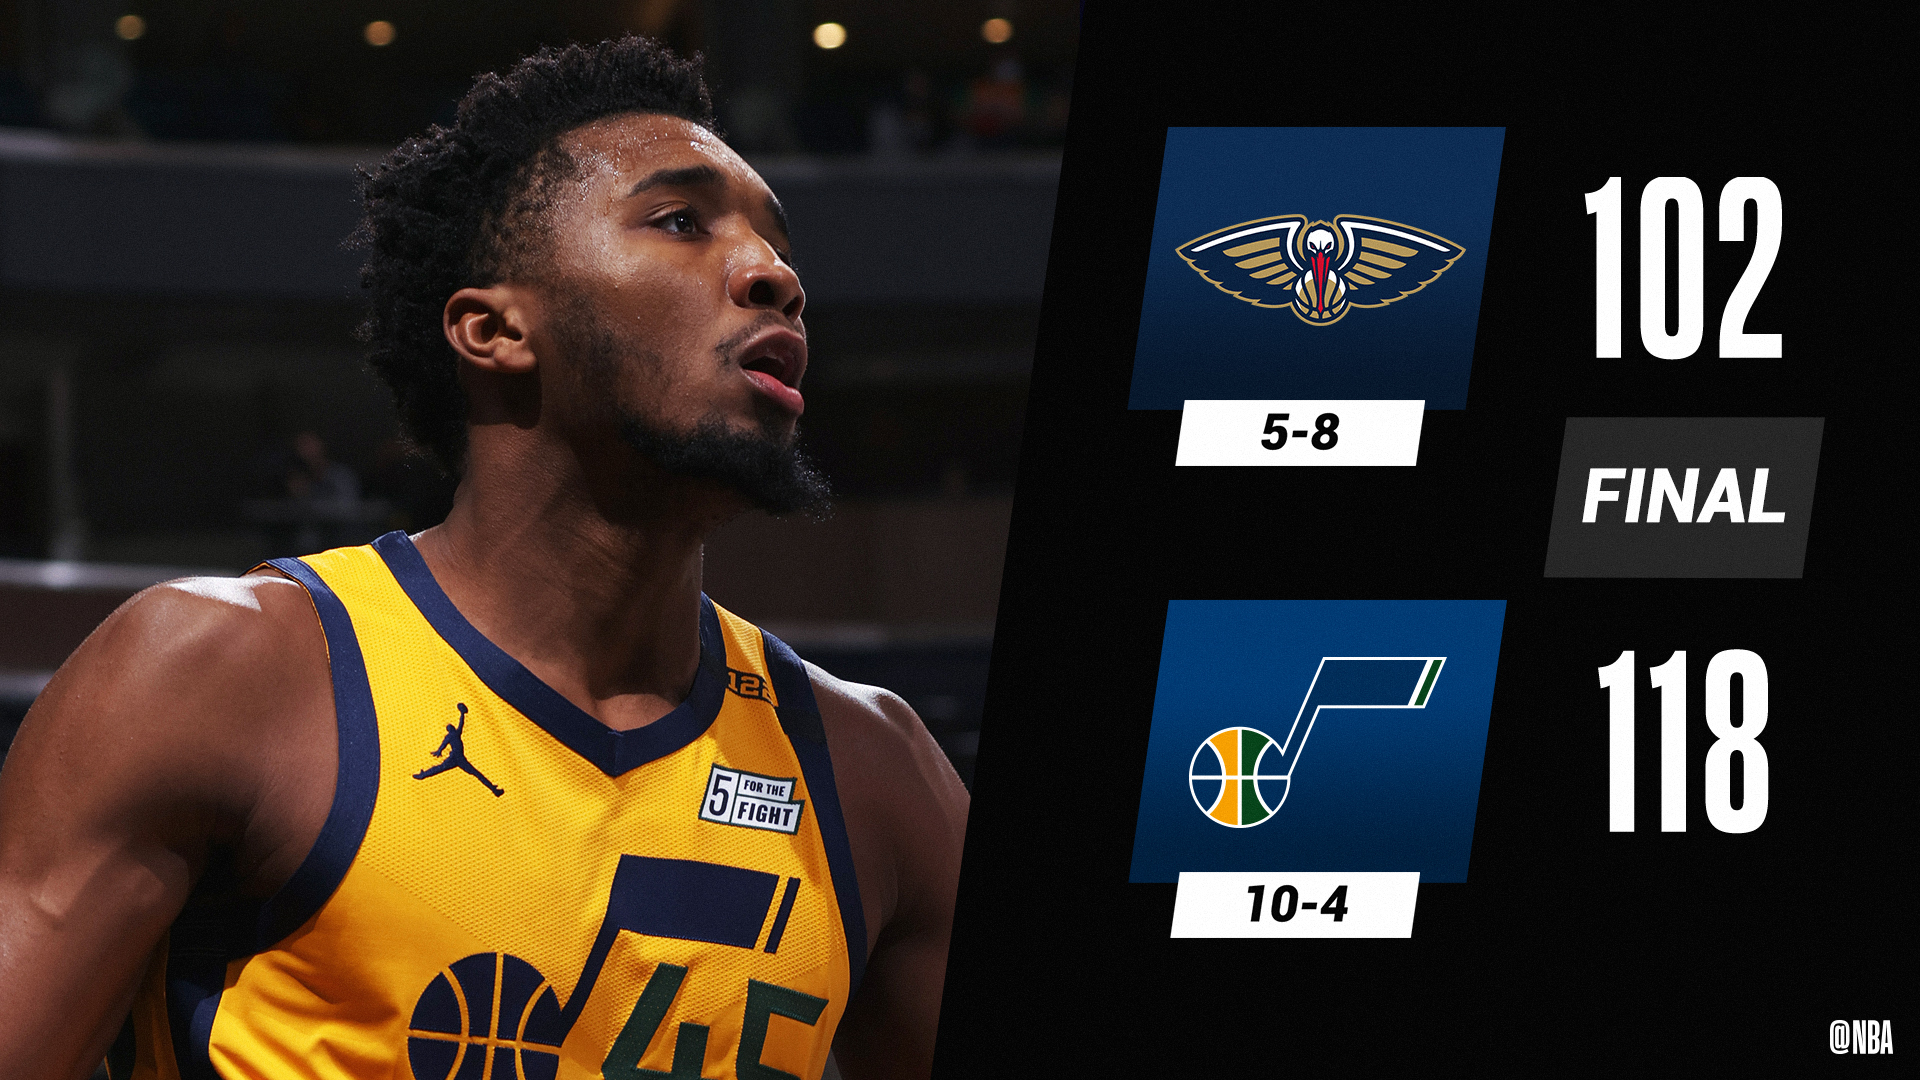 20-1-1